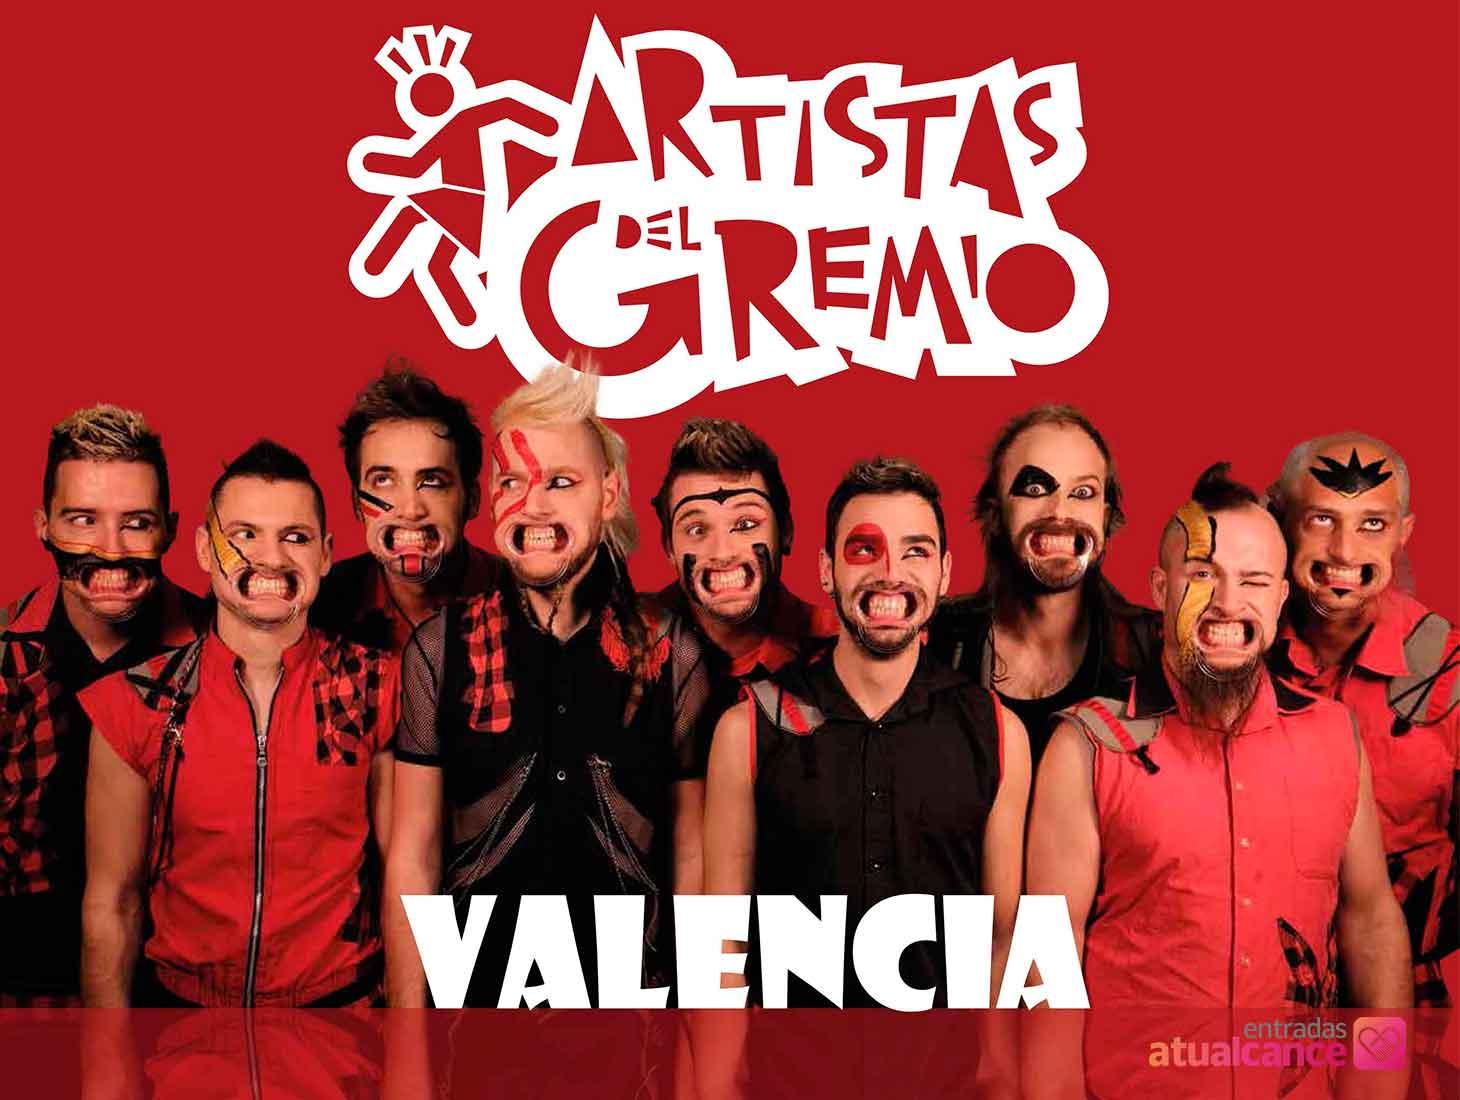 artistas-del-gremio-gps-valencia-5e1c68314ada6.jpeg